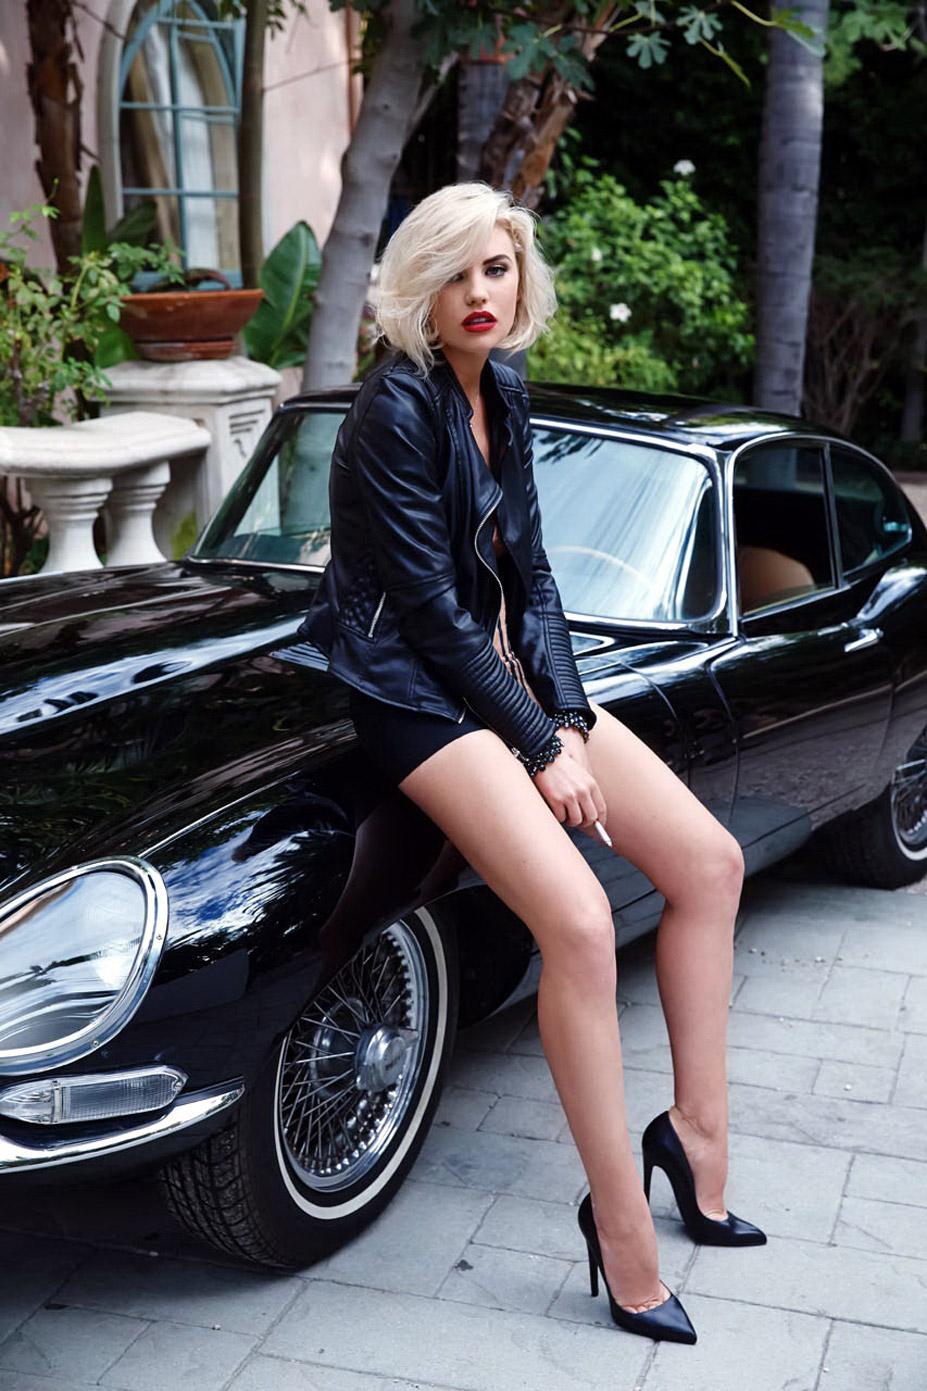 Девушка месяца Кейсли Коллинс / Kayslee Collins - Playboy USA Miss February 2015 / A classic